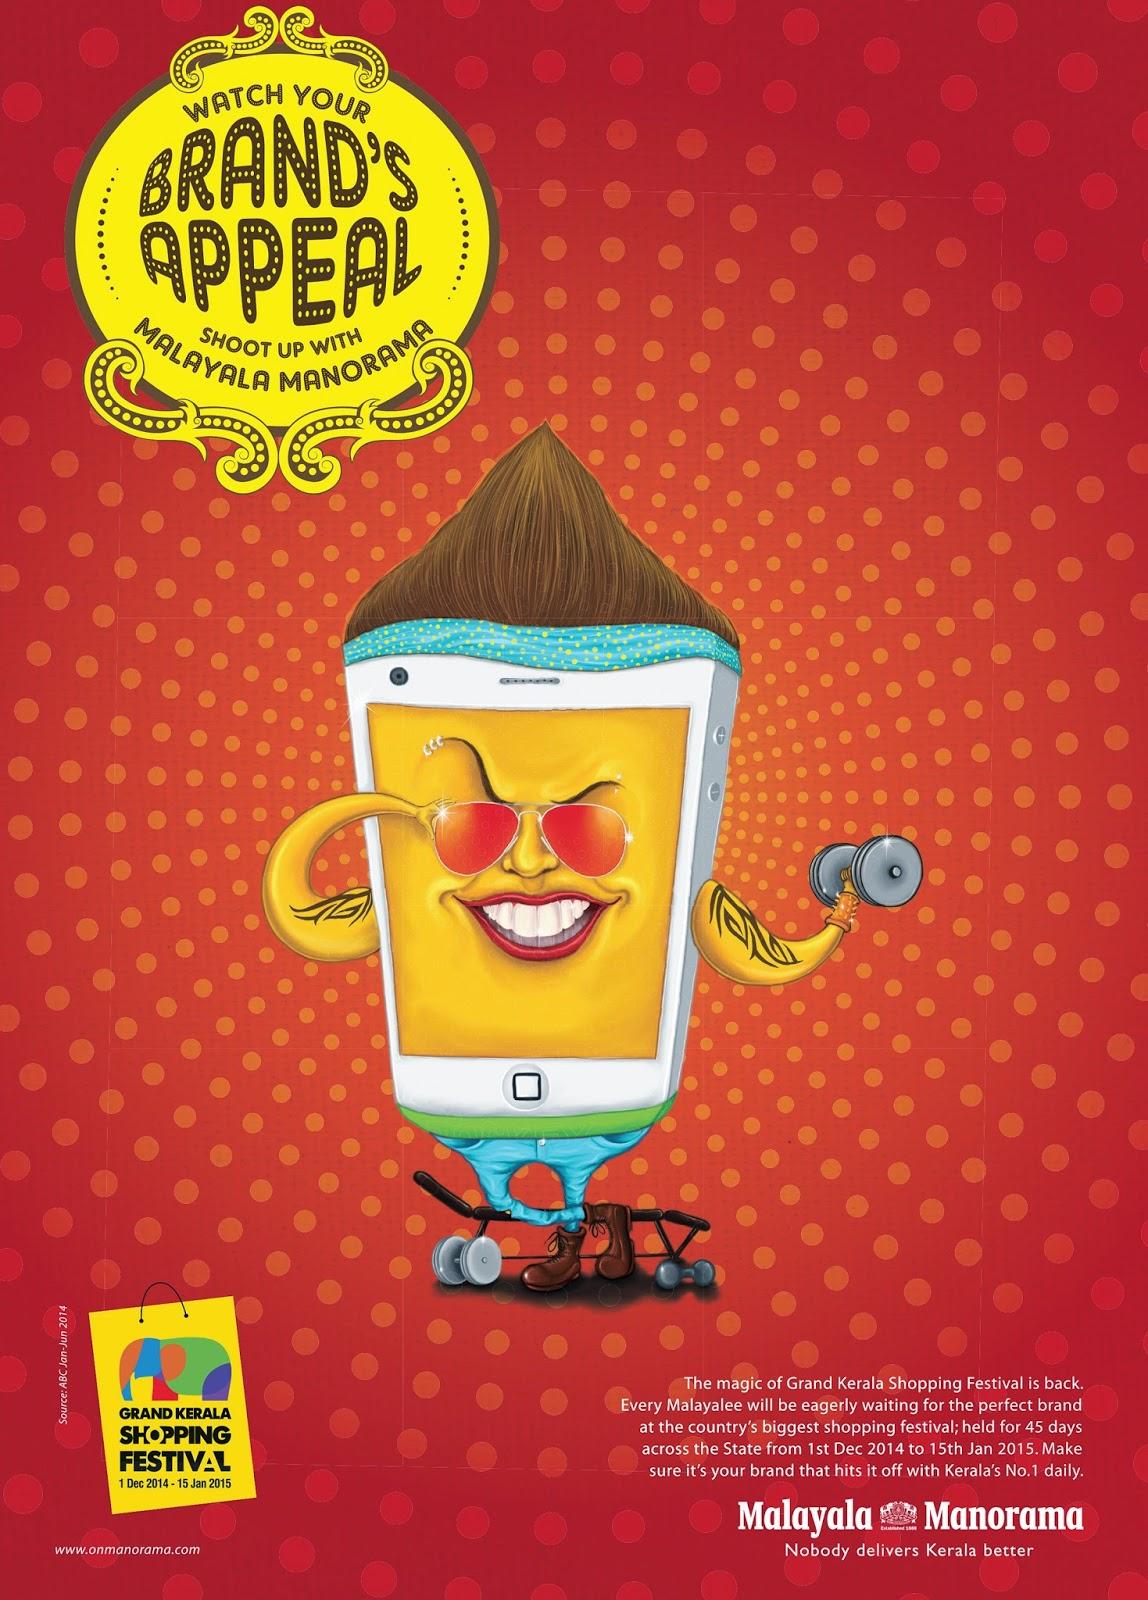 Maddys Awards   Malayala Manorma   Grand Kerala Shopping Festival 4   Stark Communications Pvt Ltd